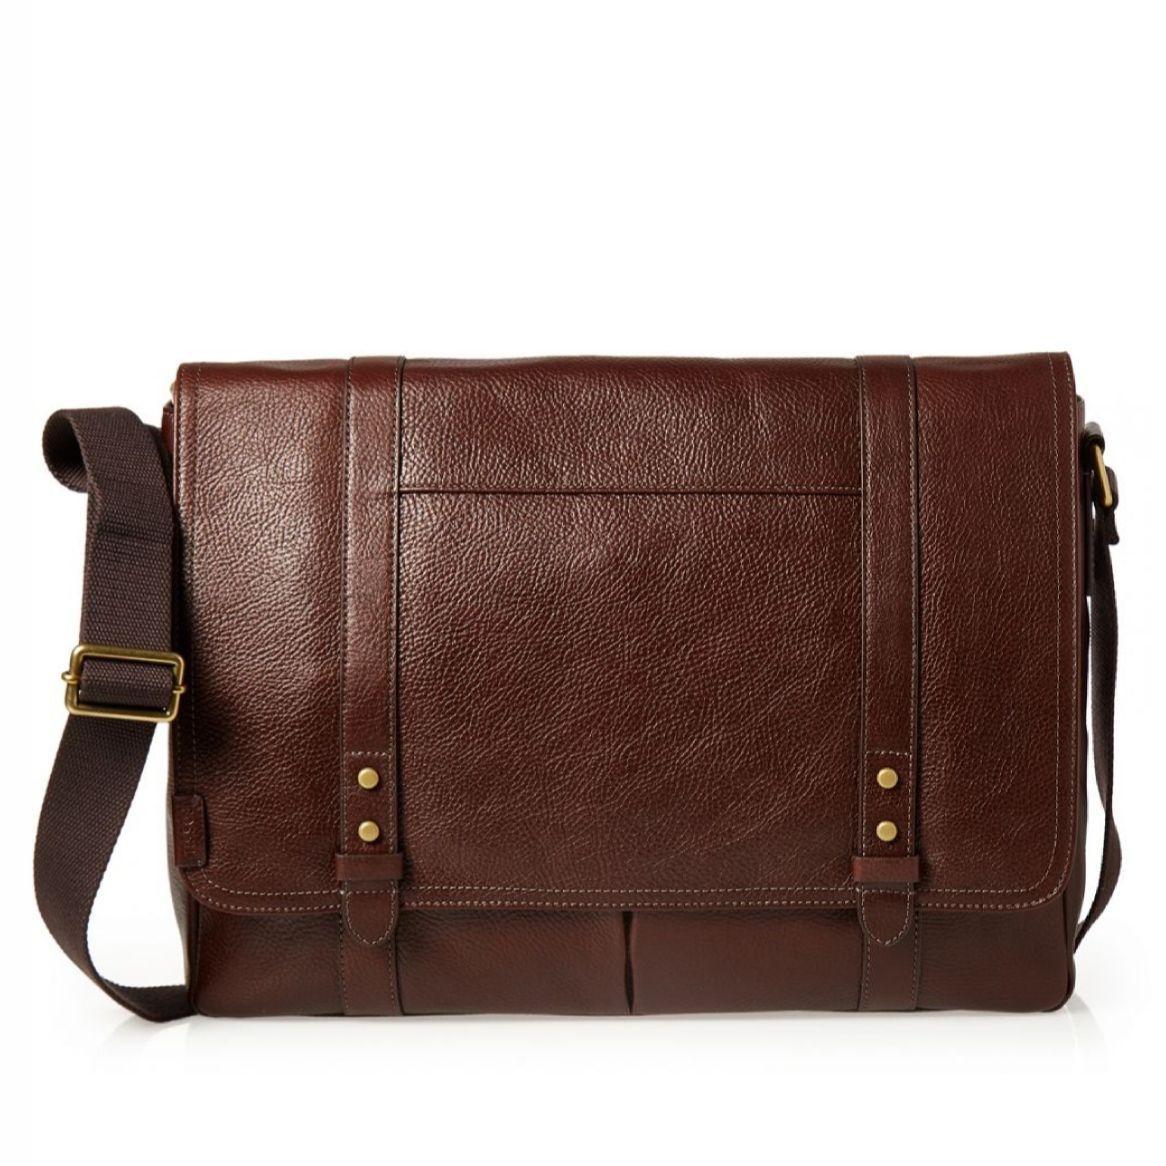 Fossil Travis Messenger Bag – Brown, SBG 1130200